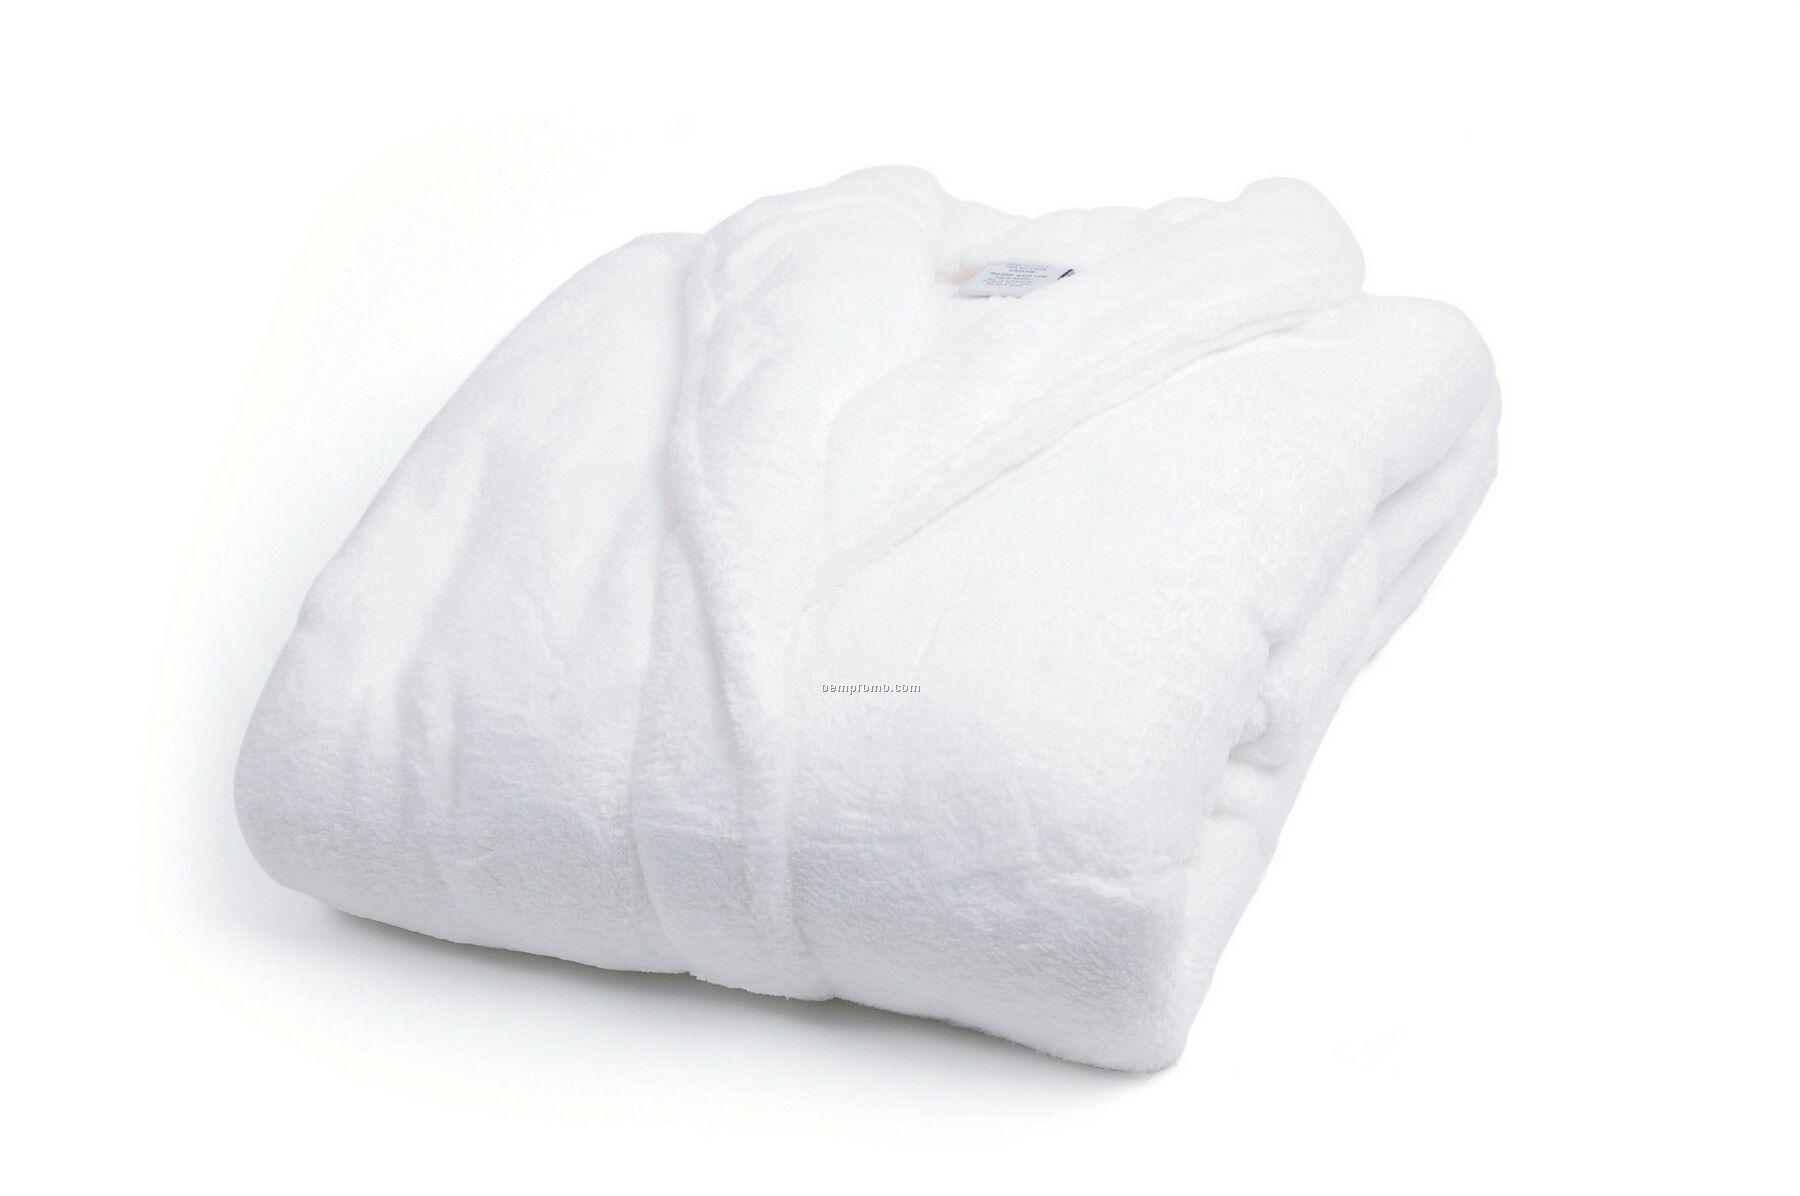 b5d7405289 Coral Fleece Robe In White W  Vinyl Case (S M)